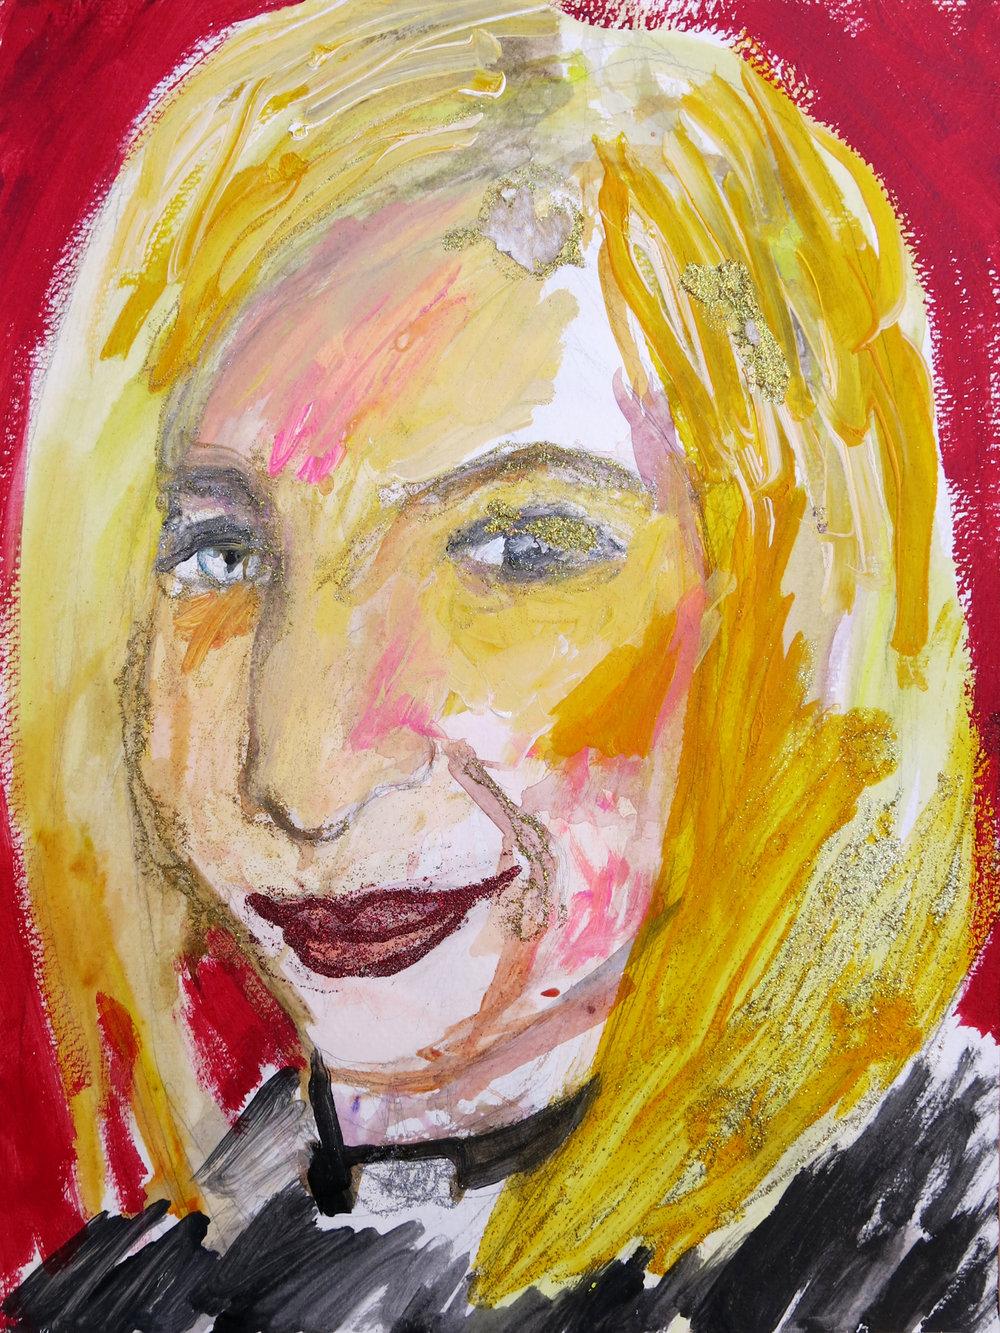 Barbra Streisand Portrait #167